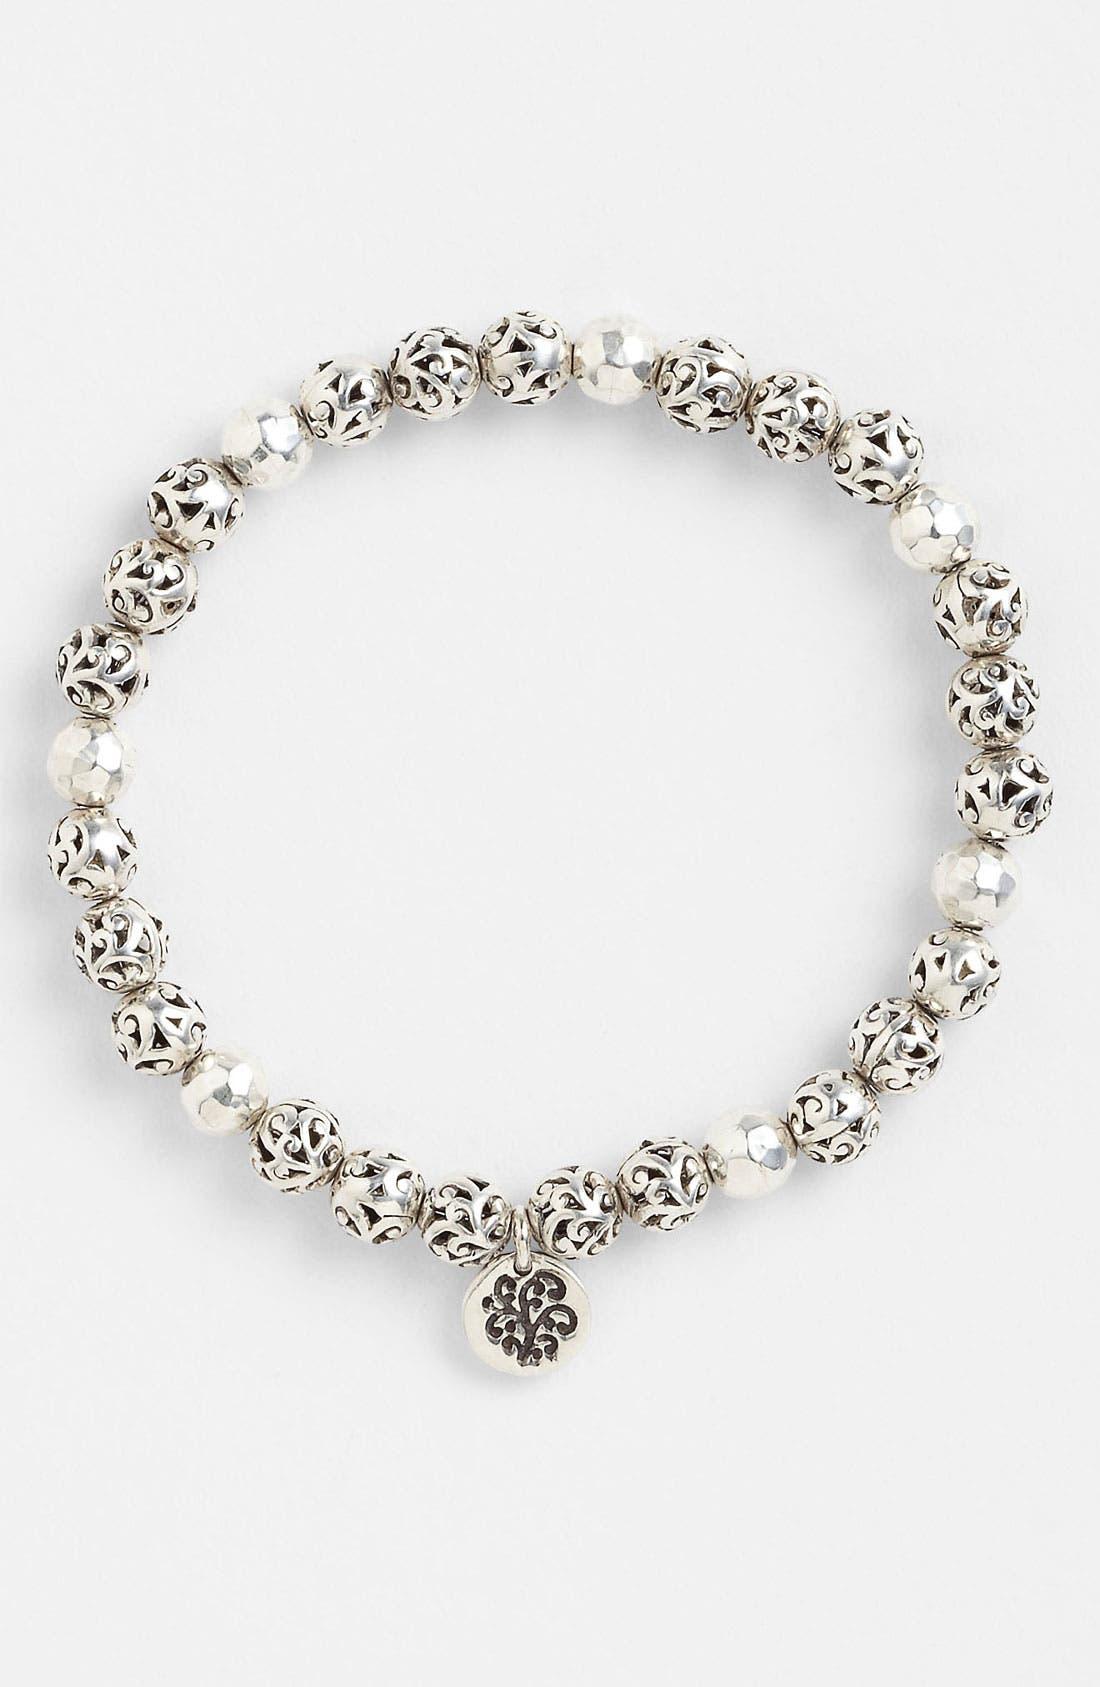 Alternate Image 1 Selected - Lois Hill 'Classics' Bead Stretch Bracelet